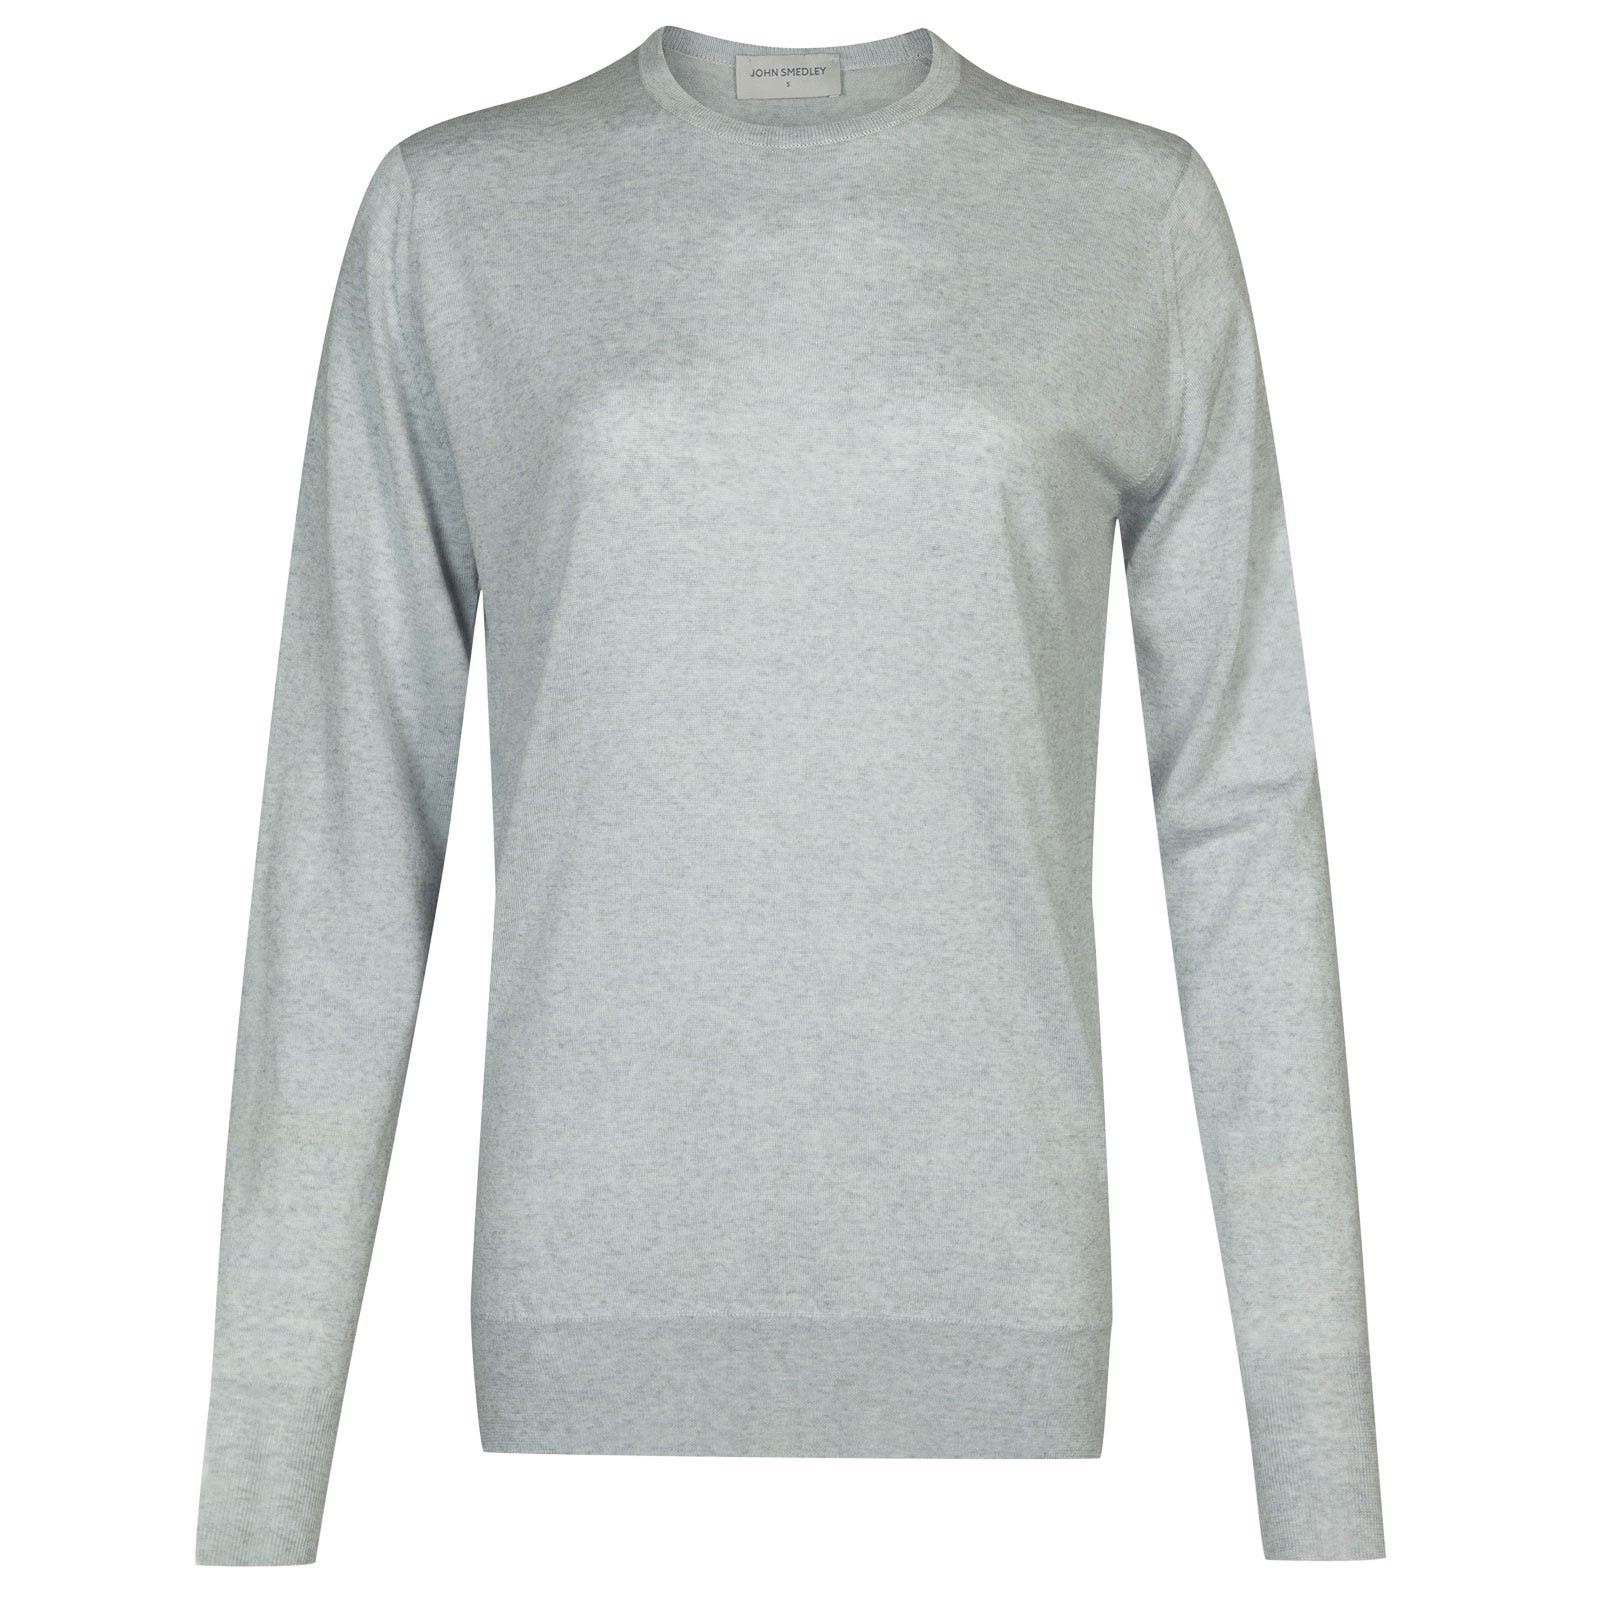 John Smedley Mitzi Merino Wool Sweater in Bardot Grey-XL